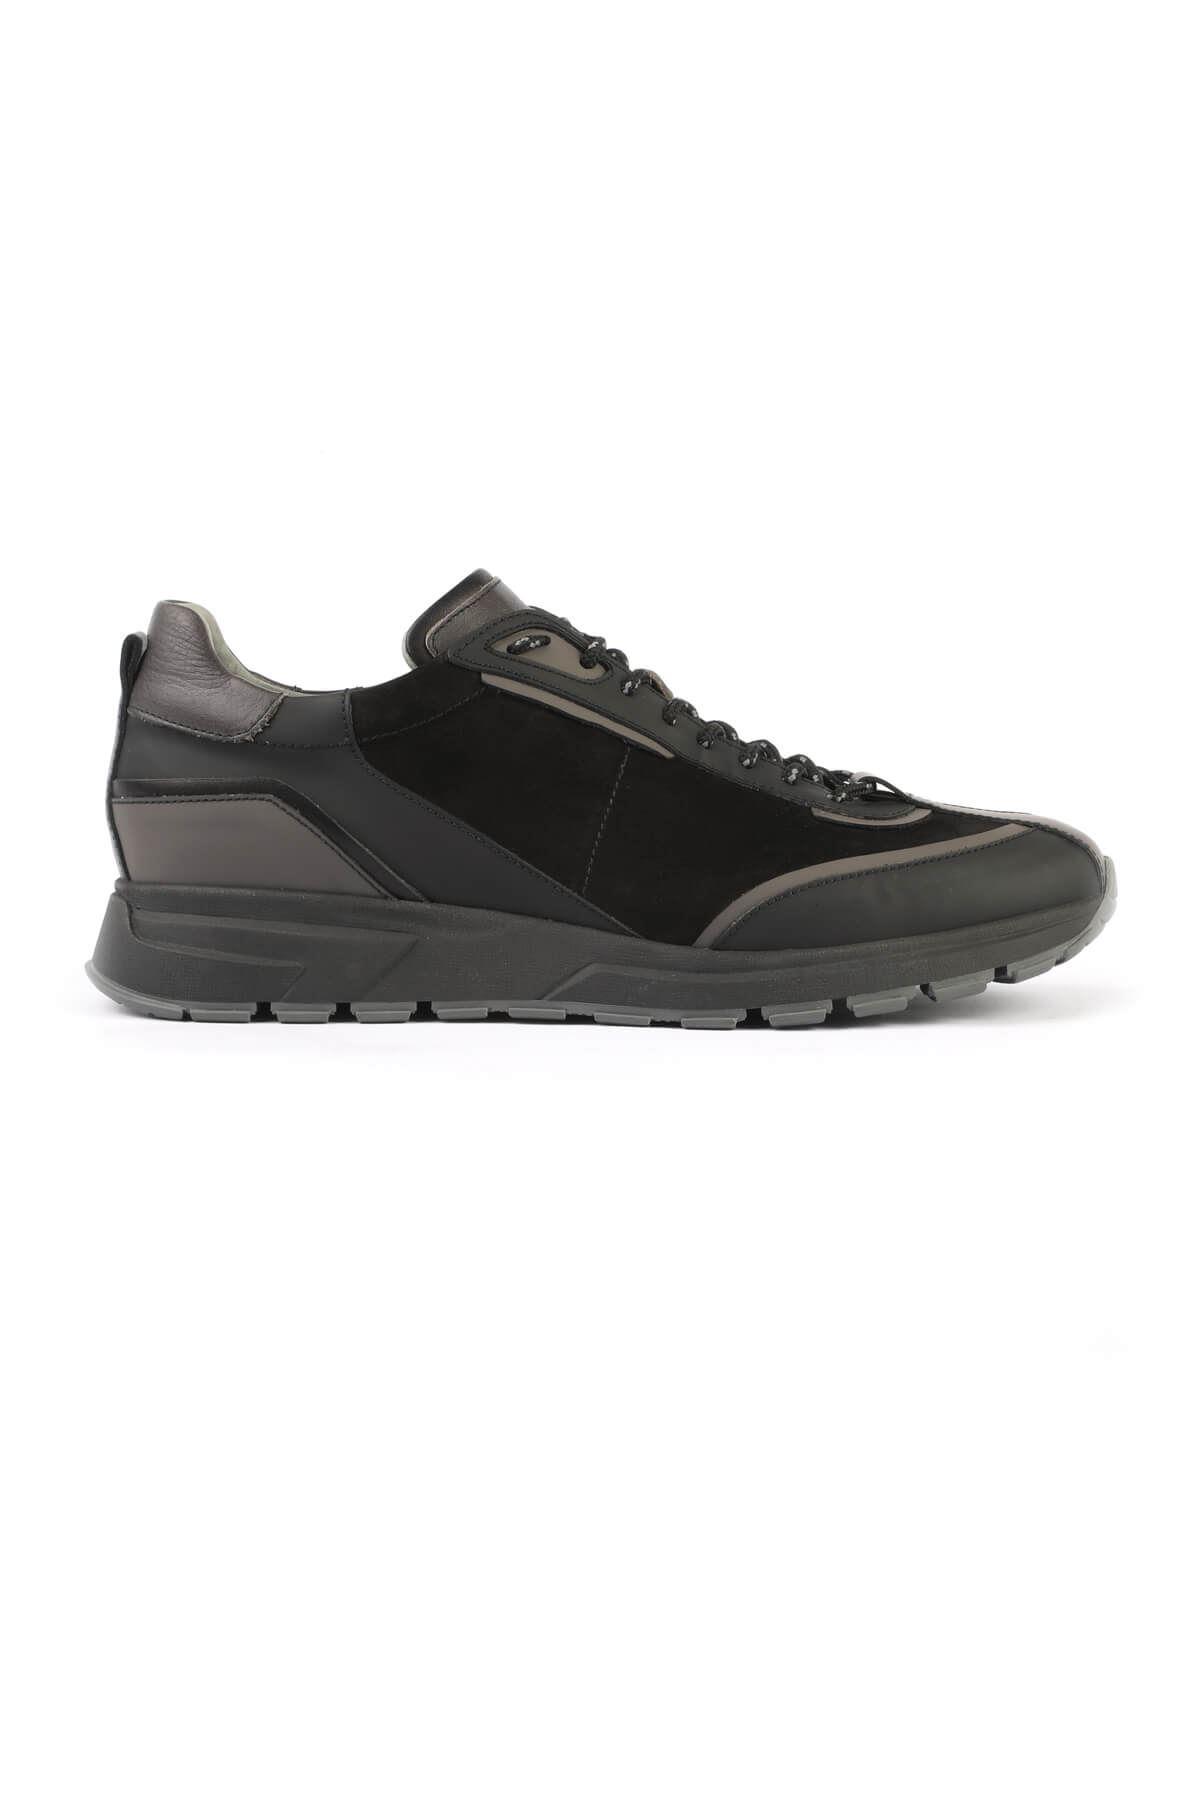 Libero 3147 Black Gray Sport Shoes